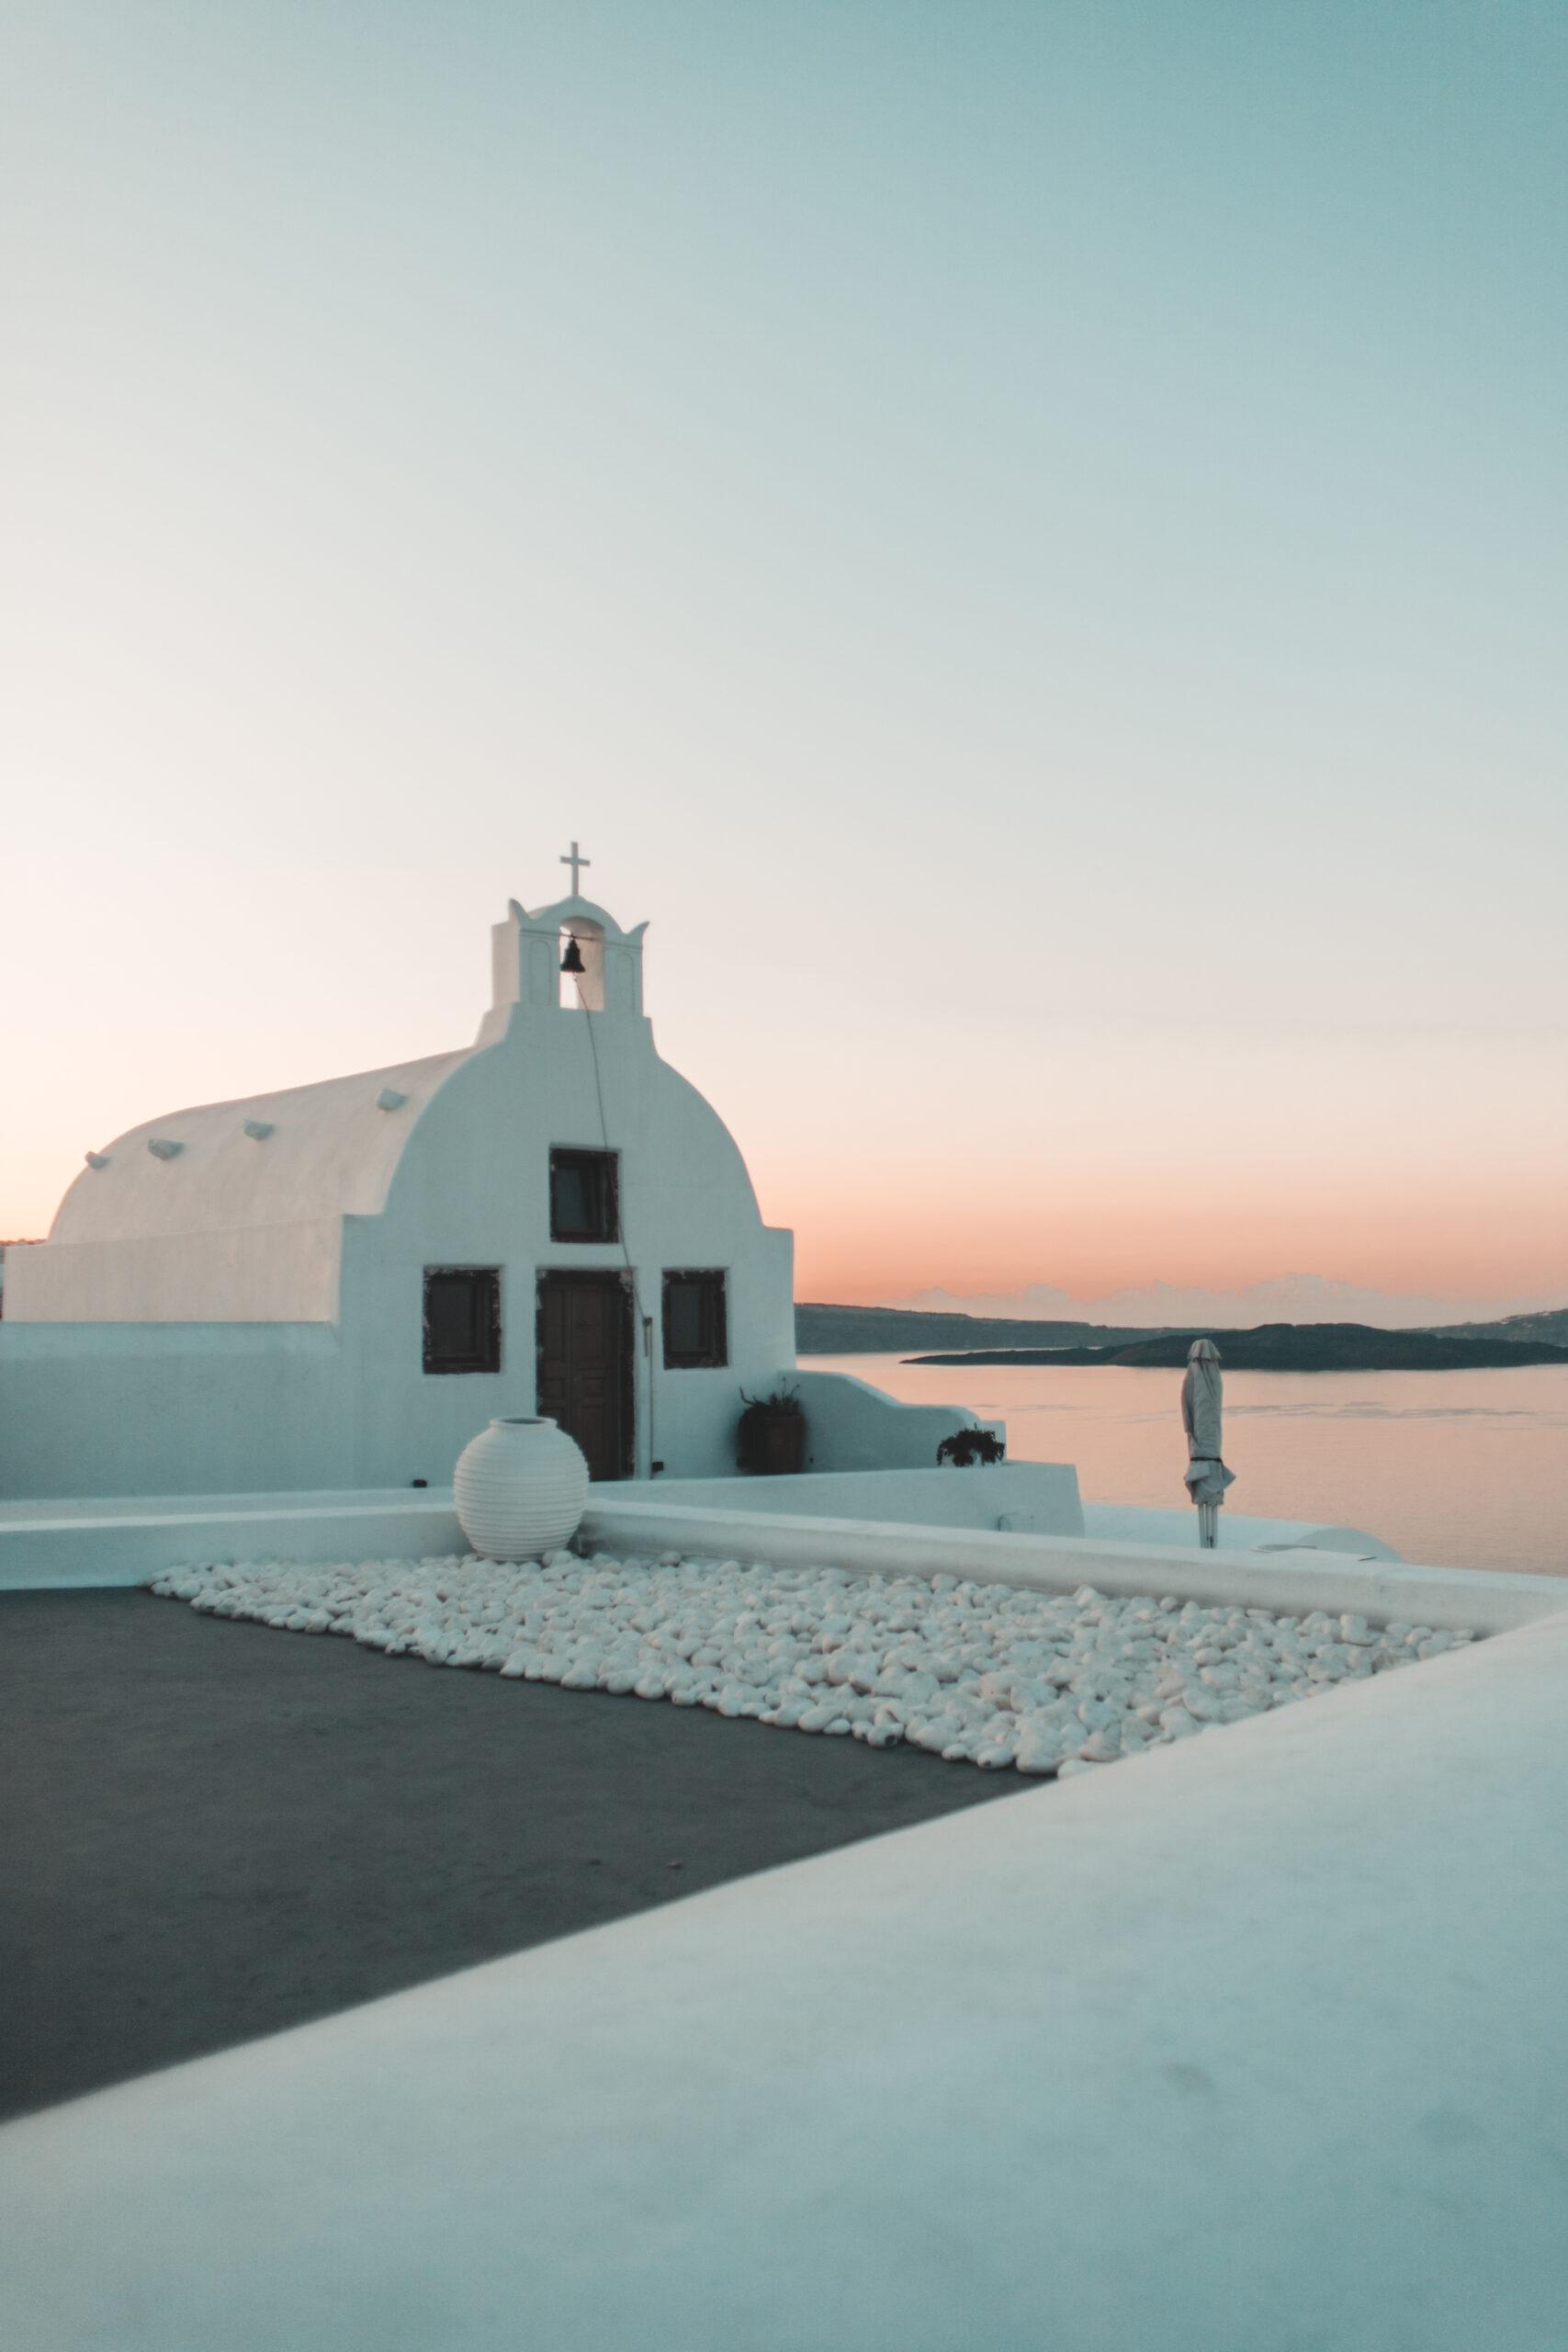 Sunrise Oia, wschód słońca Oia, zachód słońca Oia, Santorini, dzwonnica, cerkiew, church